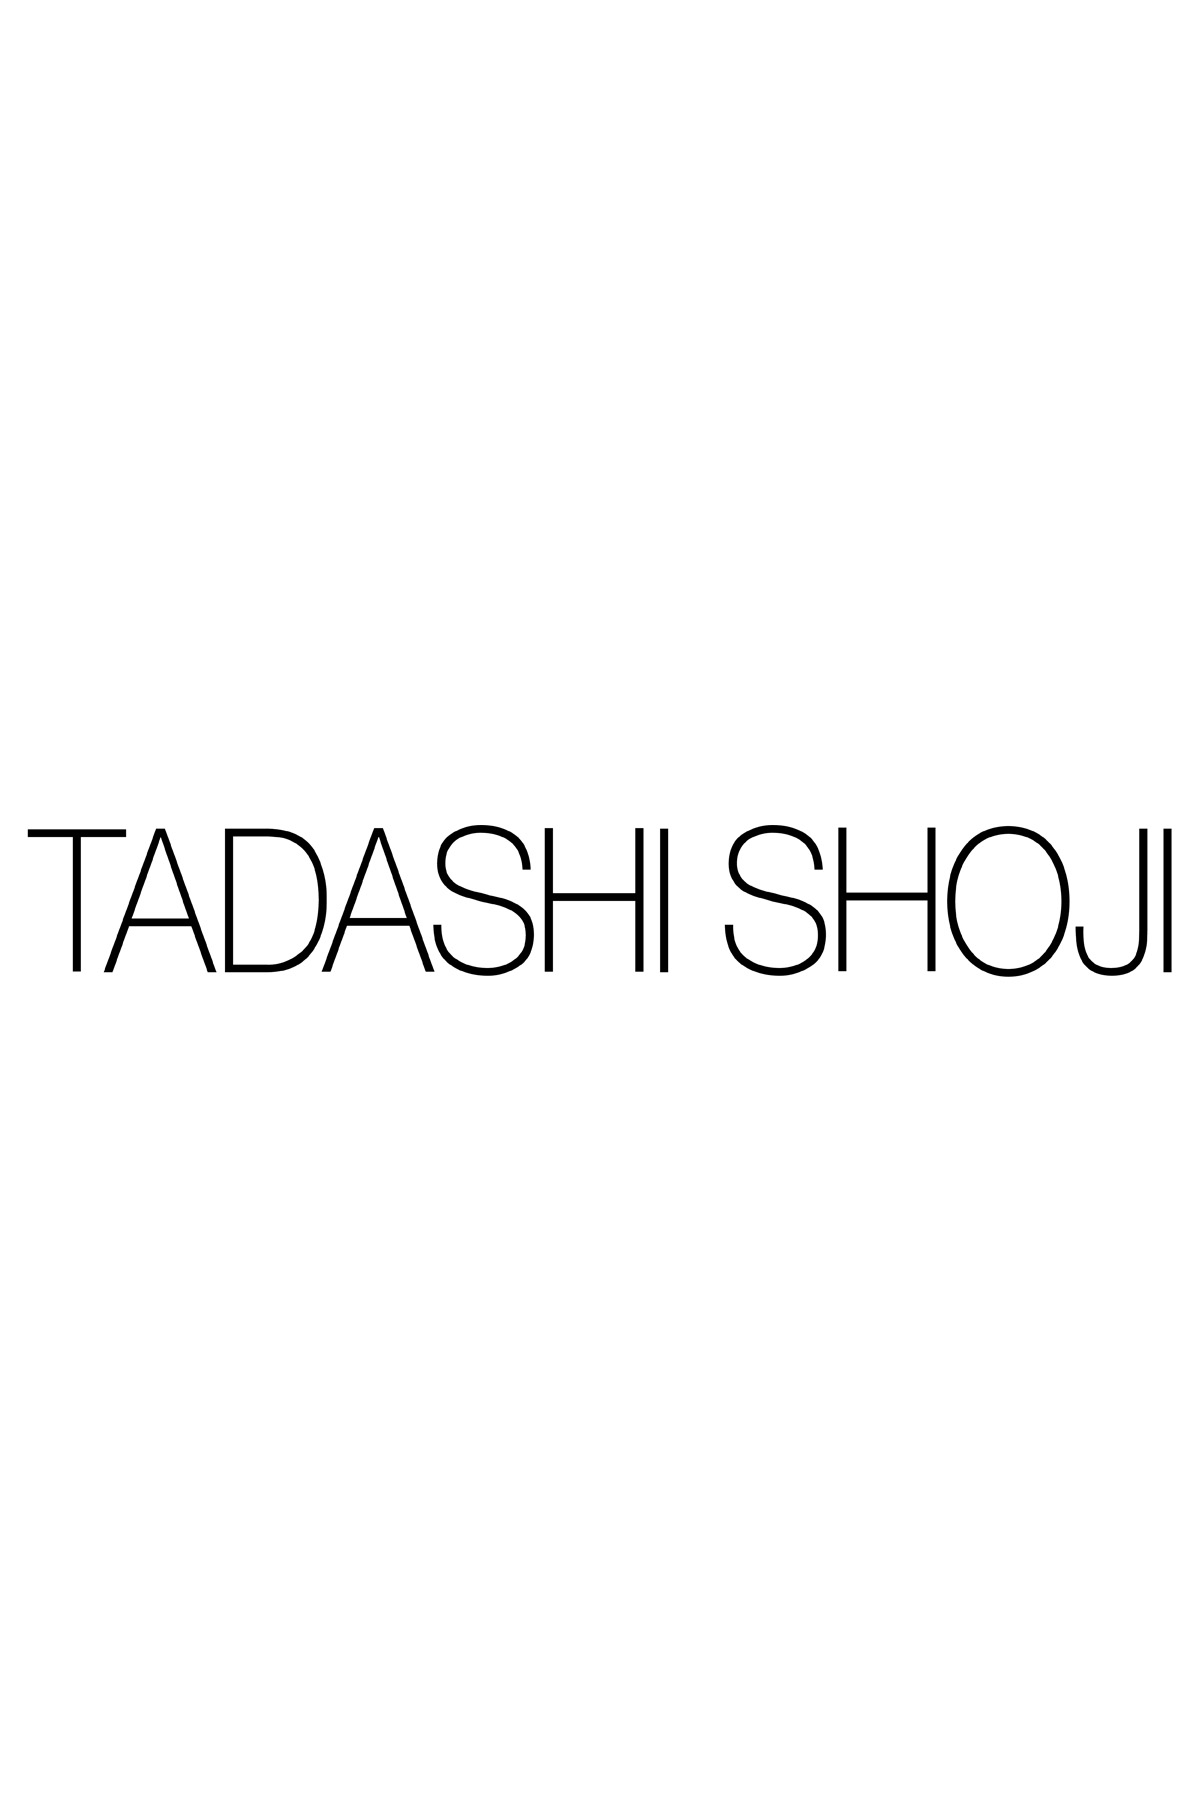 Tadashi Shoji - Izalie Embroidered Sequin Dress